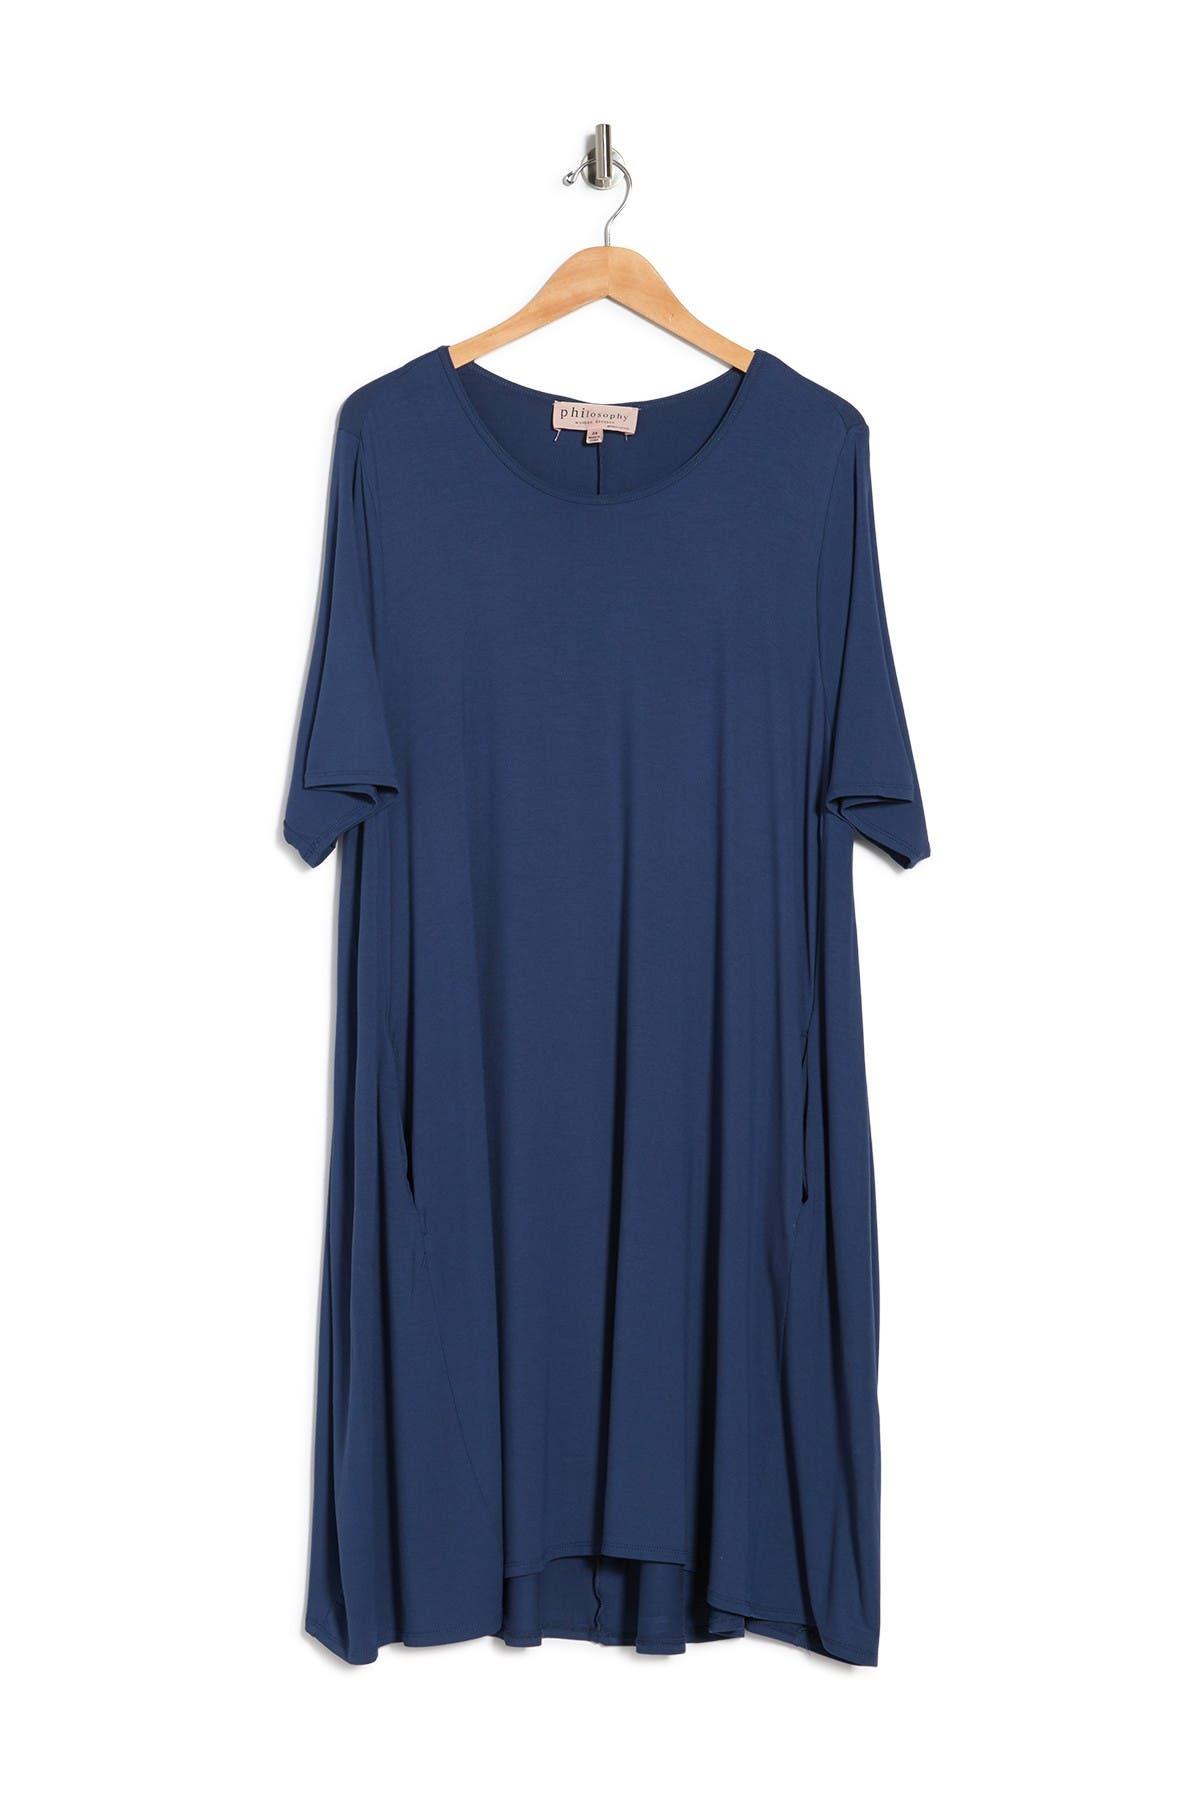 Image of Philosophy Apparel Elbow Sleeve Knit Swing Dress